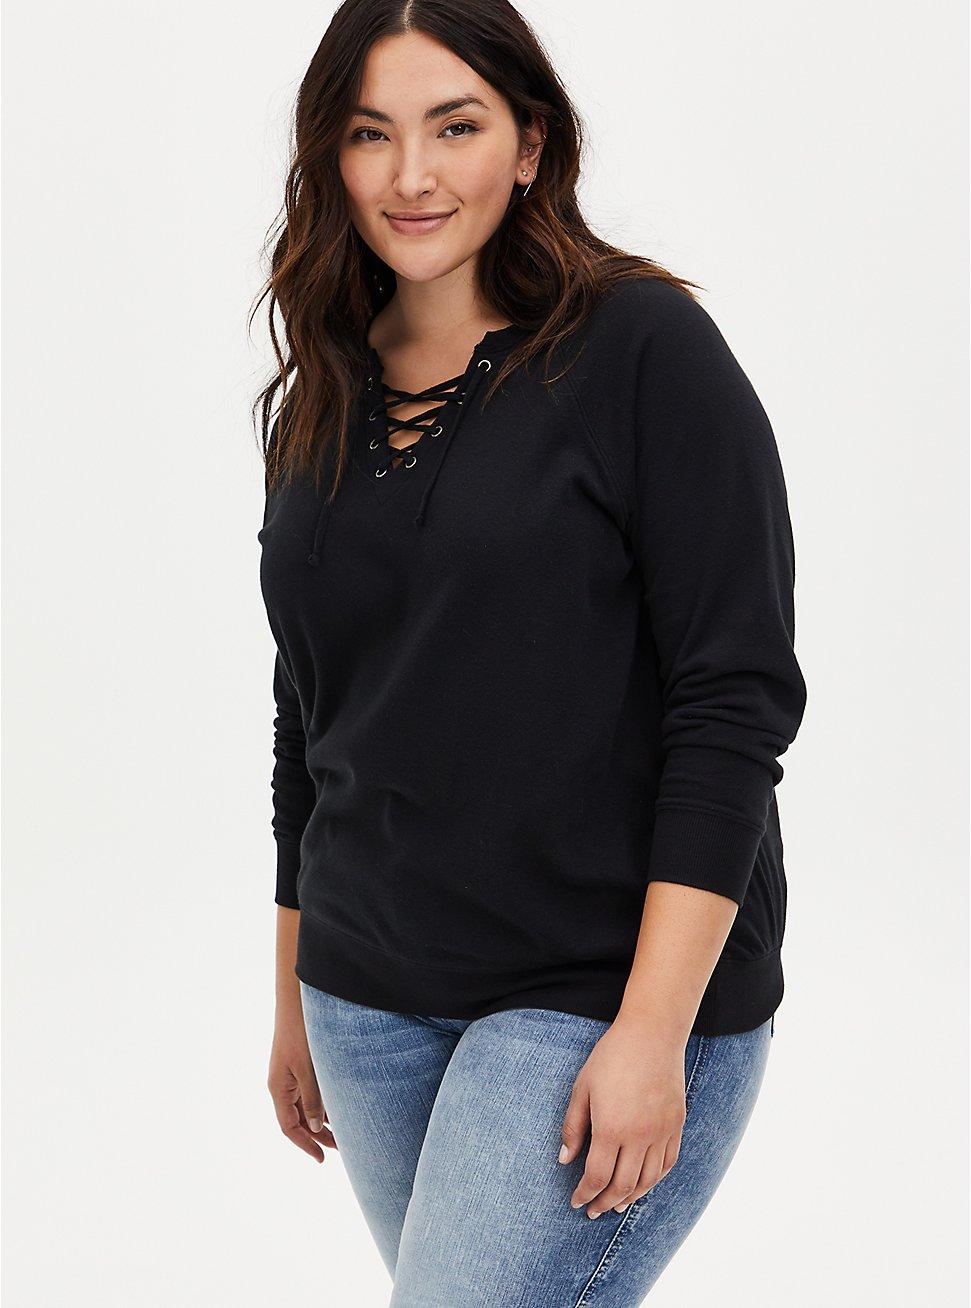 Black Lace-Up Fleece Sweatshirt, DEEP BLACK, hi-res